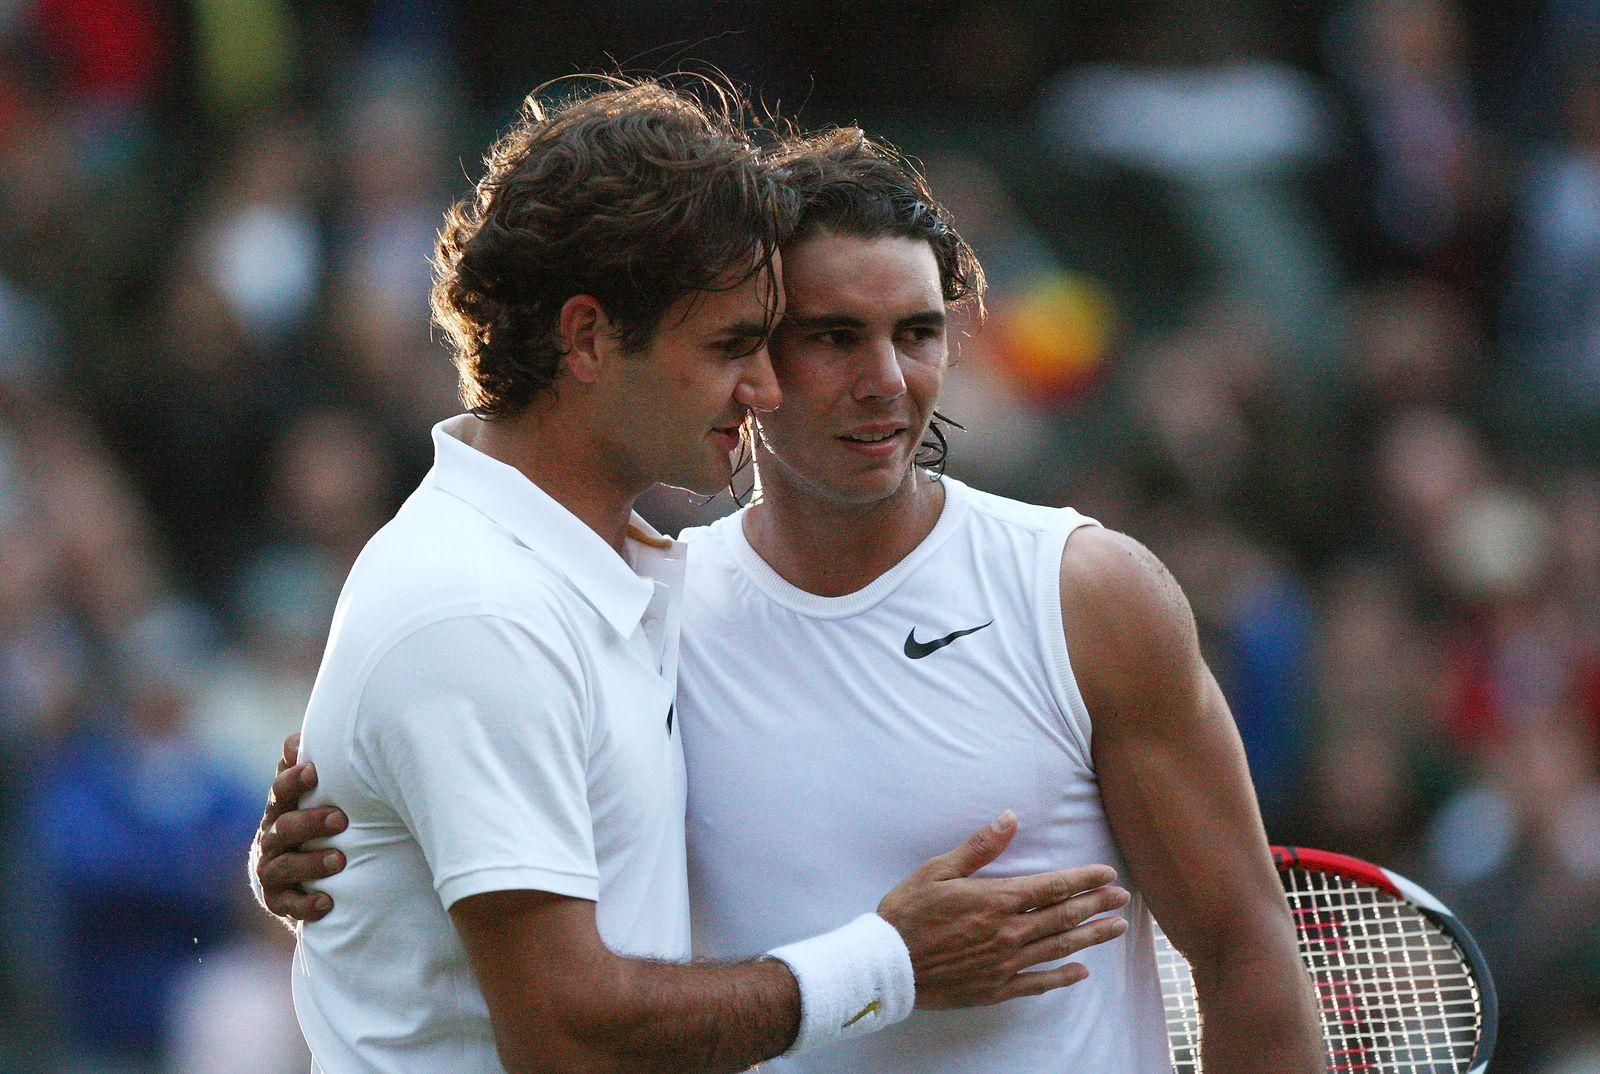 The Championships - Wimbledon 2008 Day Thirteen